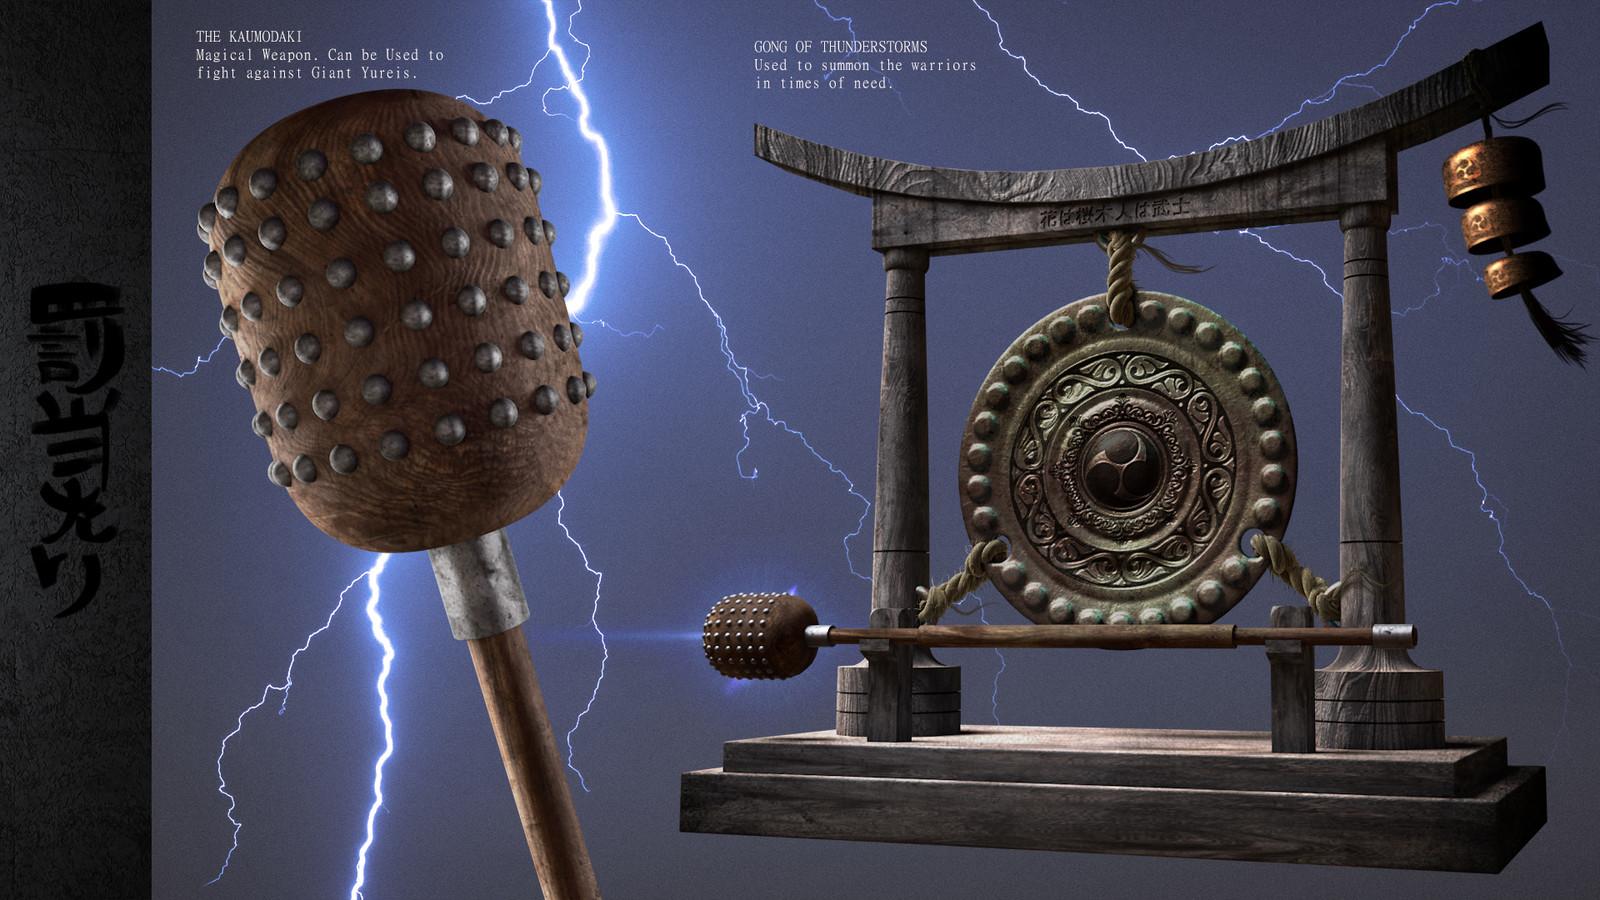 The StormCaller Gong